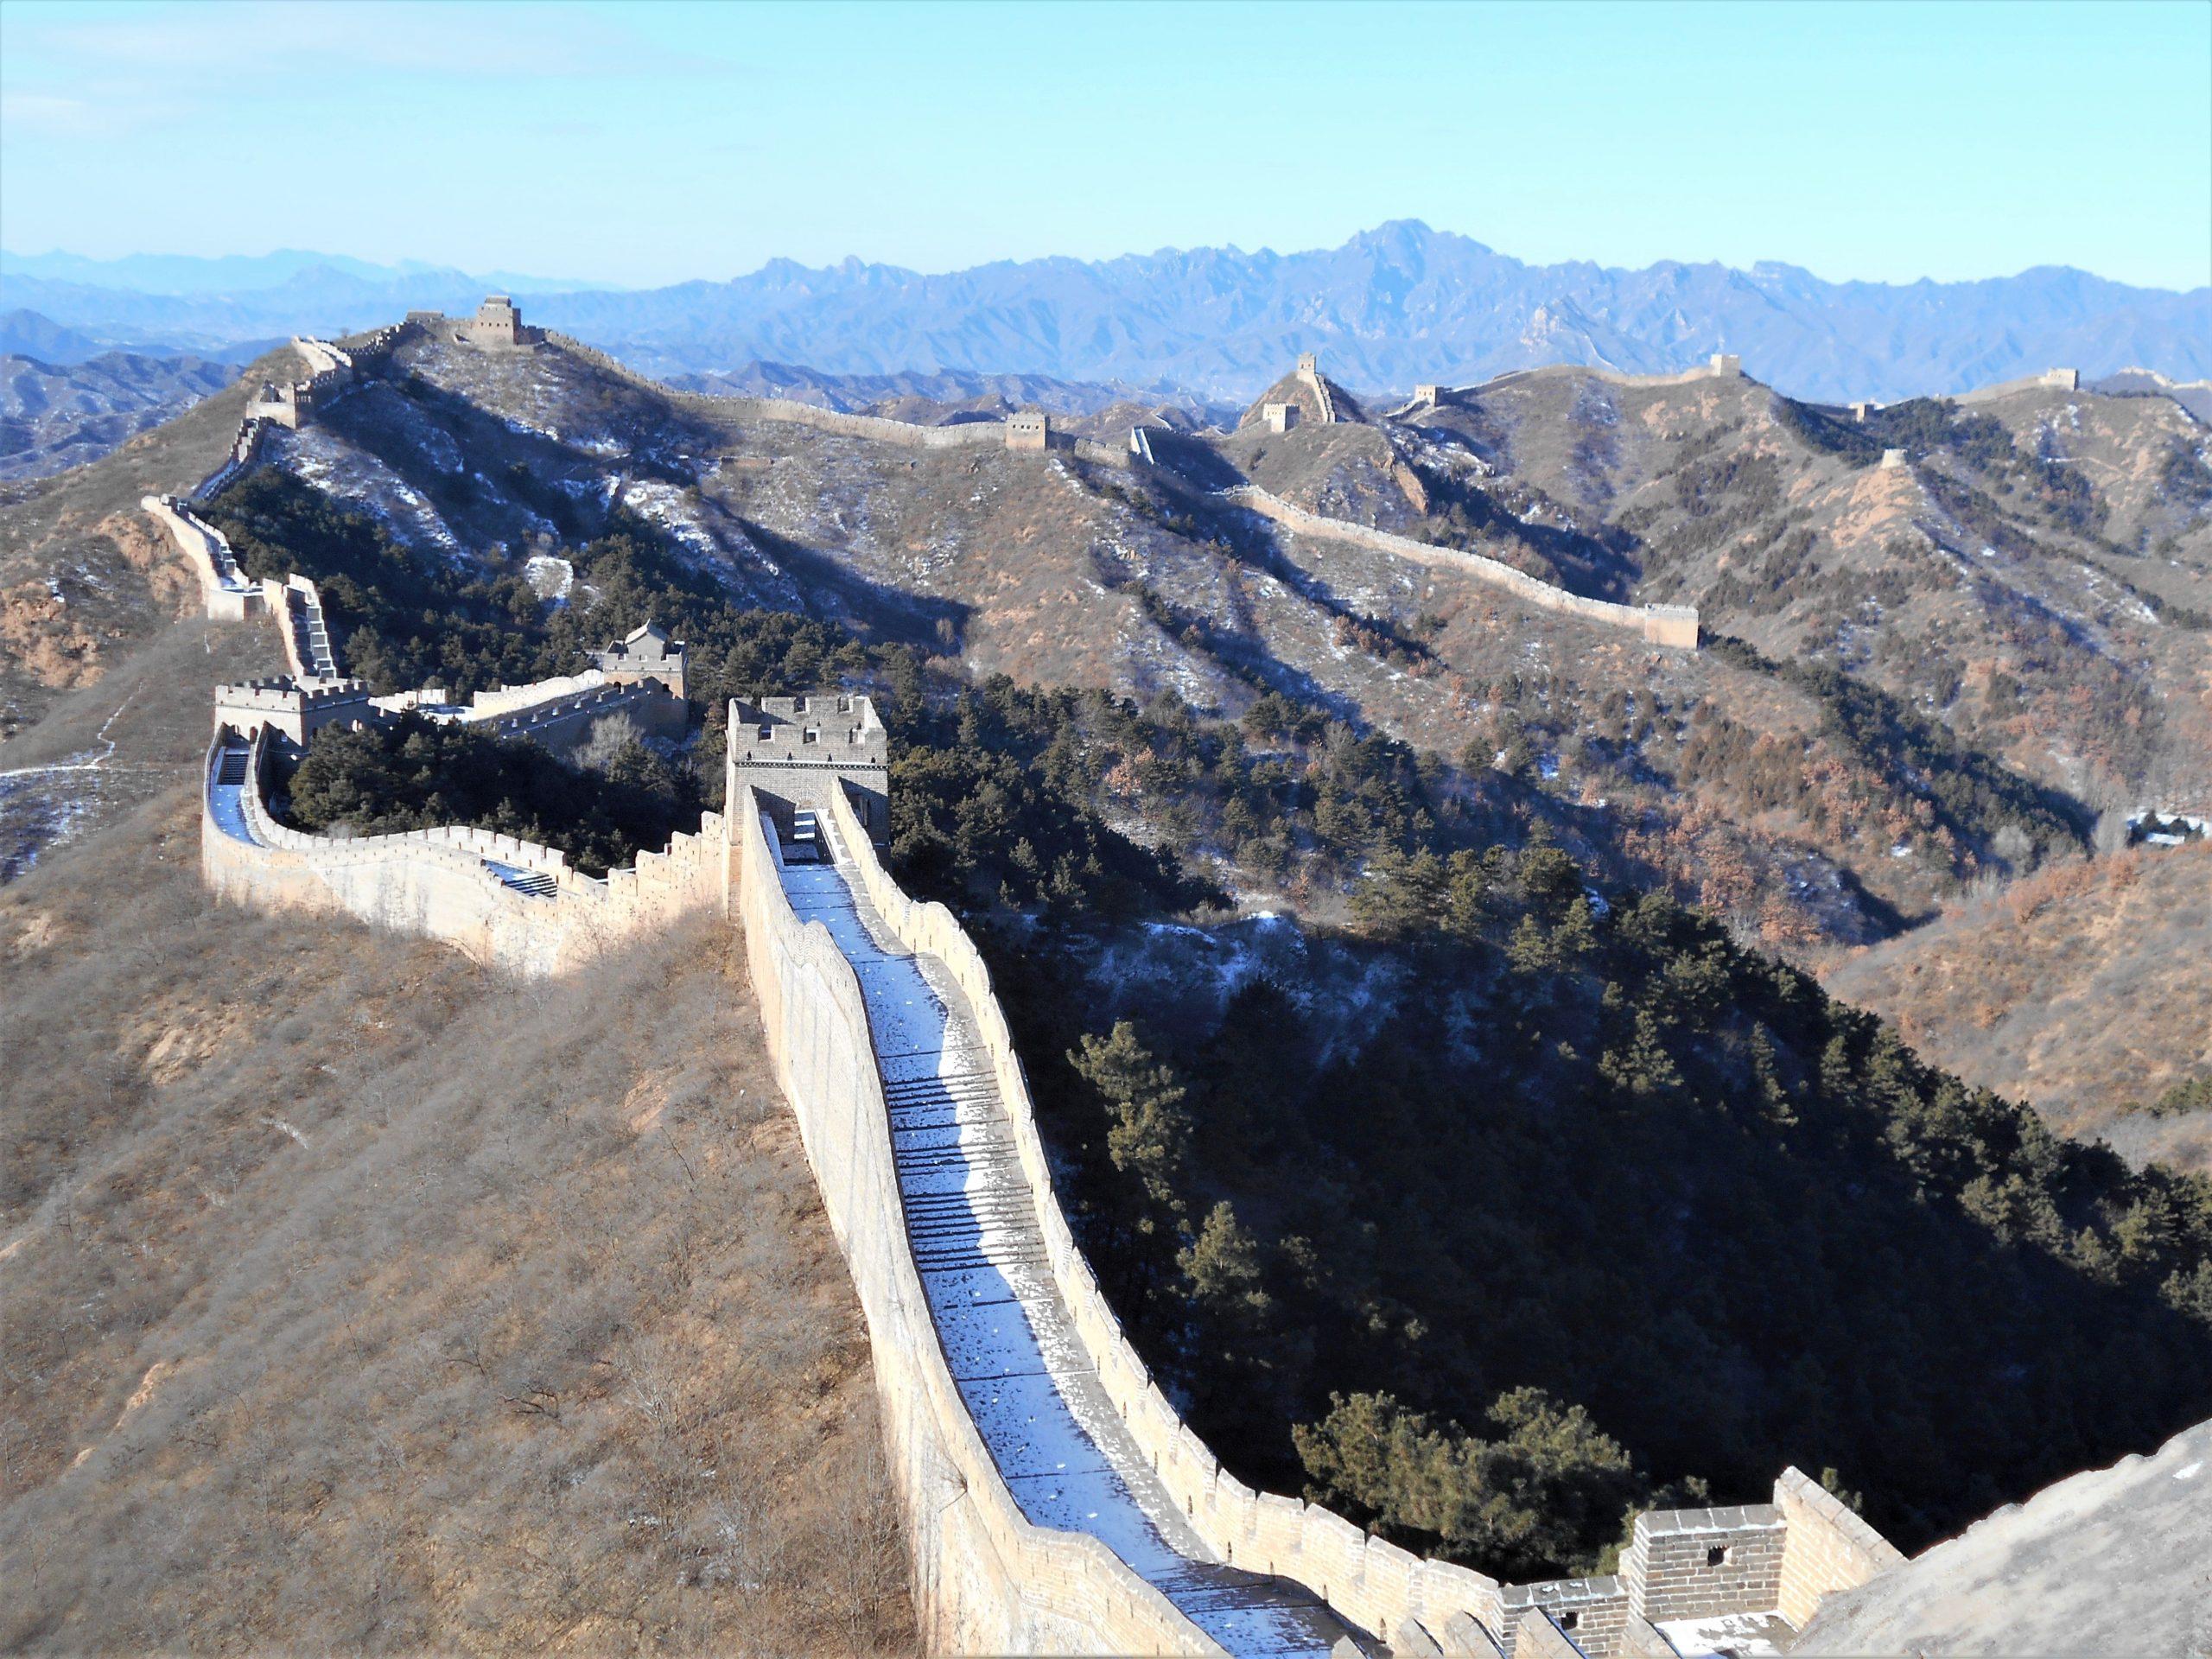 muraille de chine portion Jinshanling